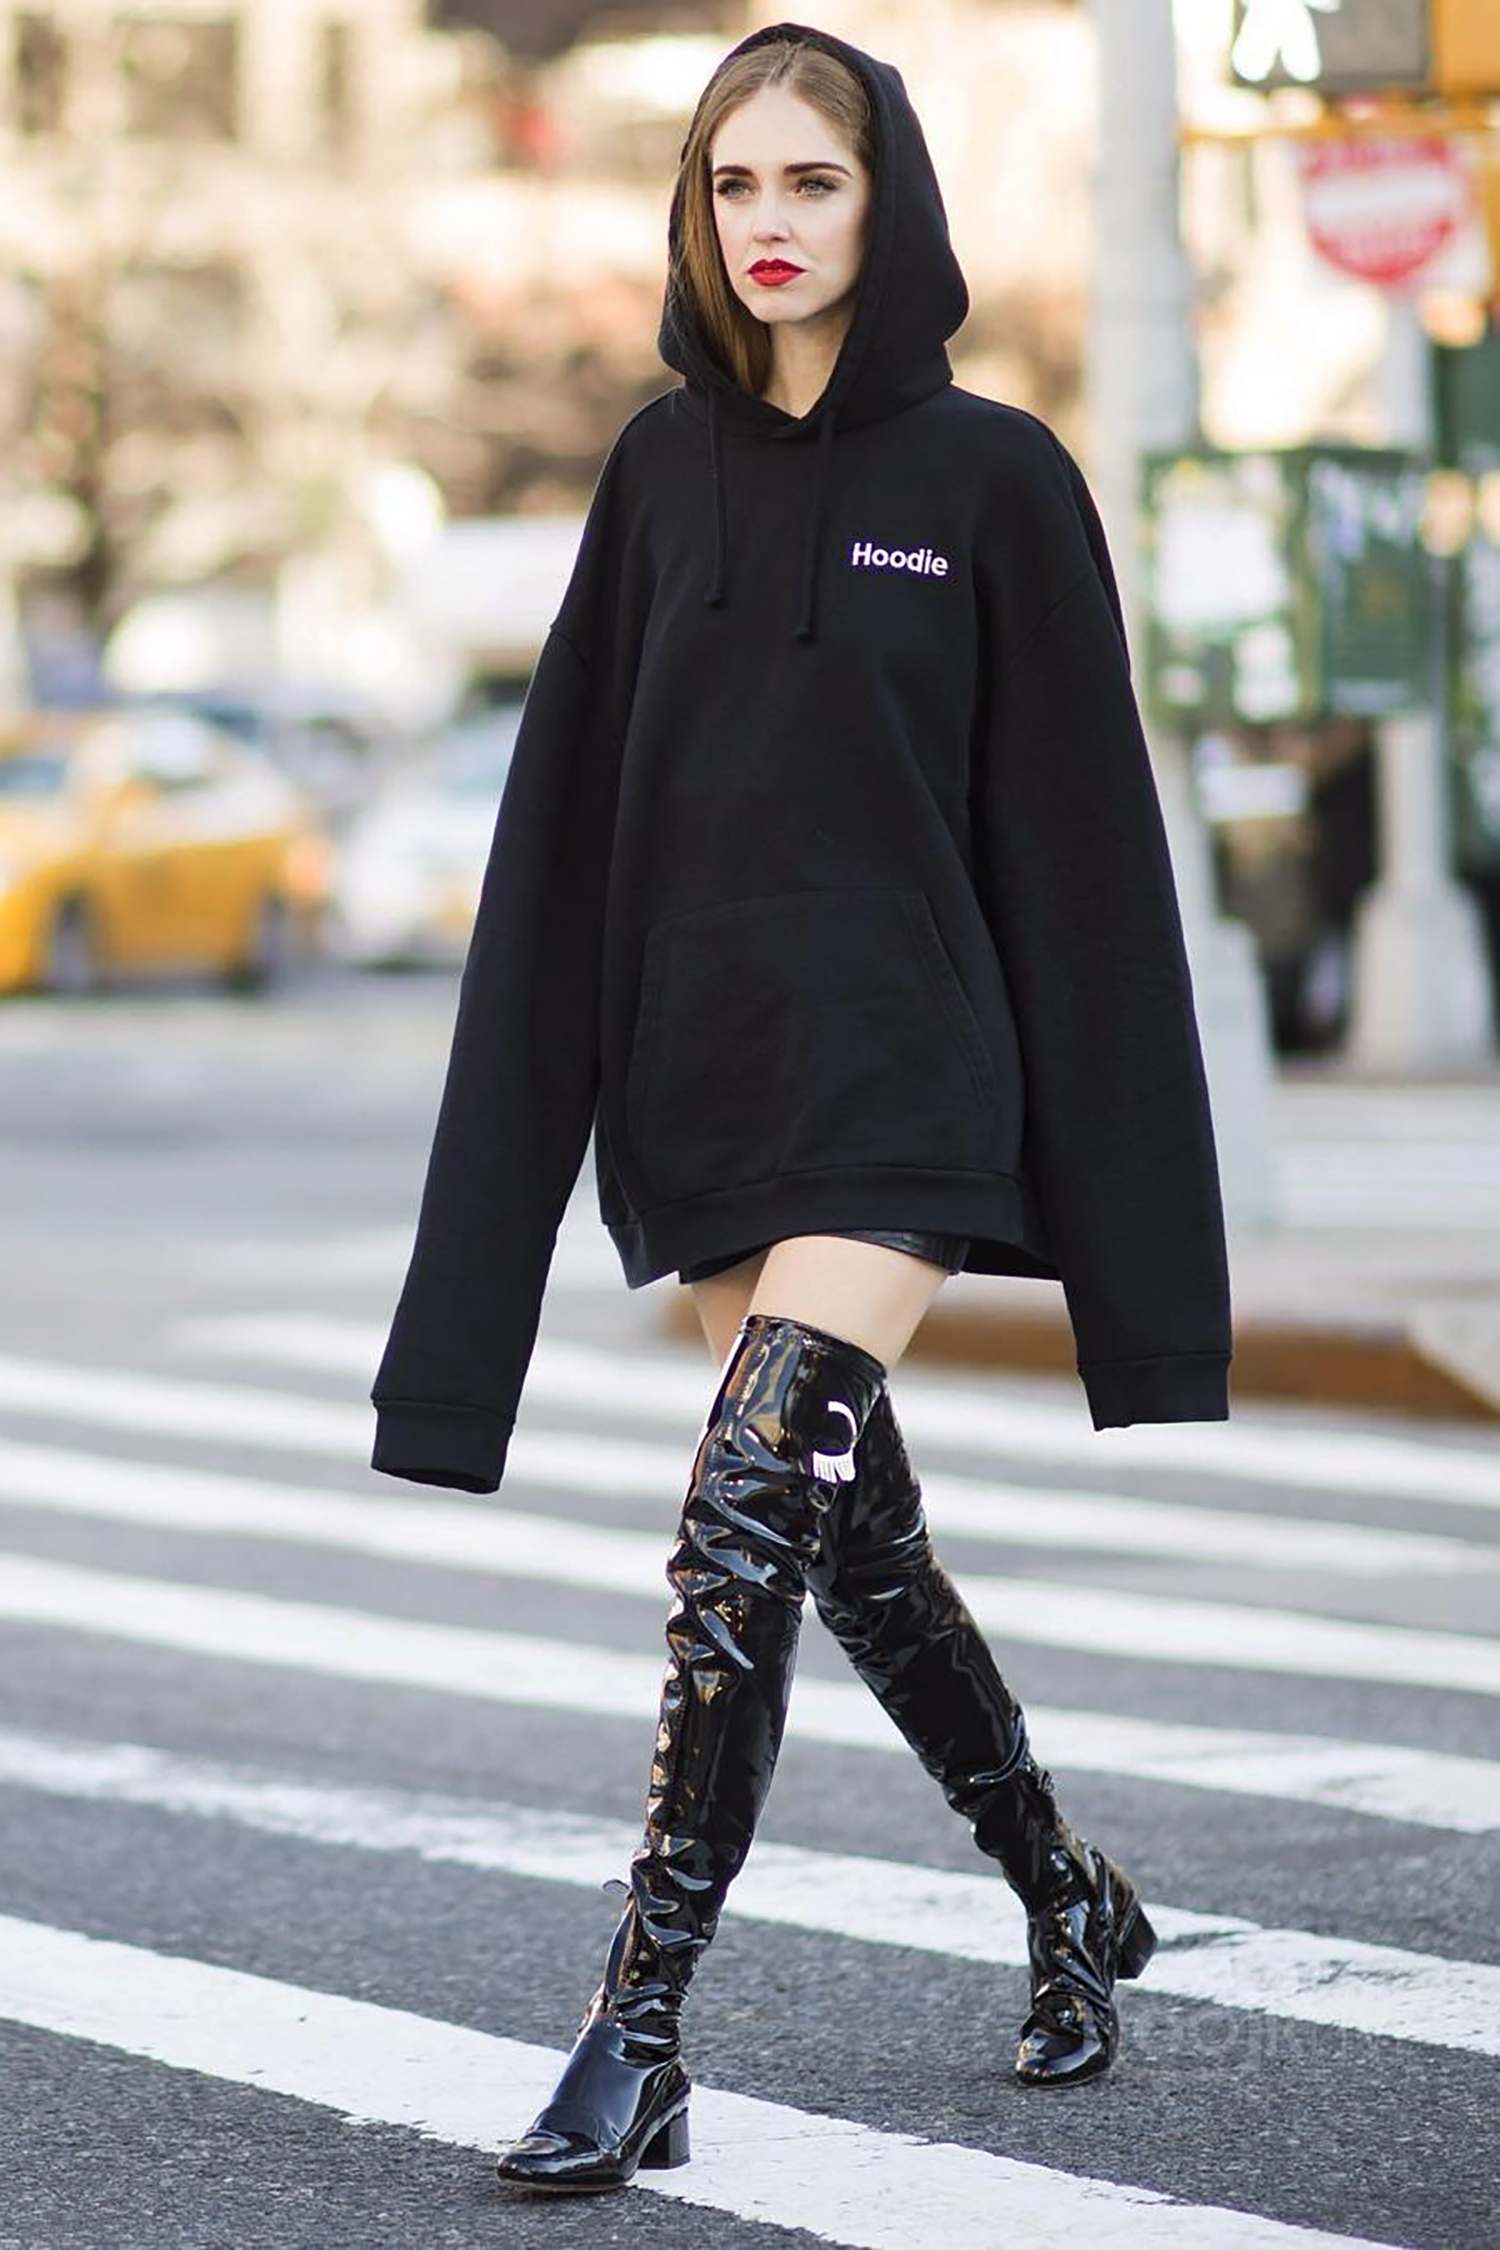 chiara-ferragni-hoodie-street-style